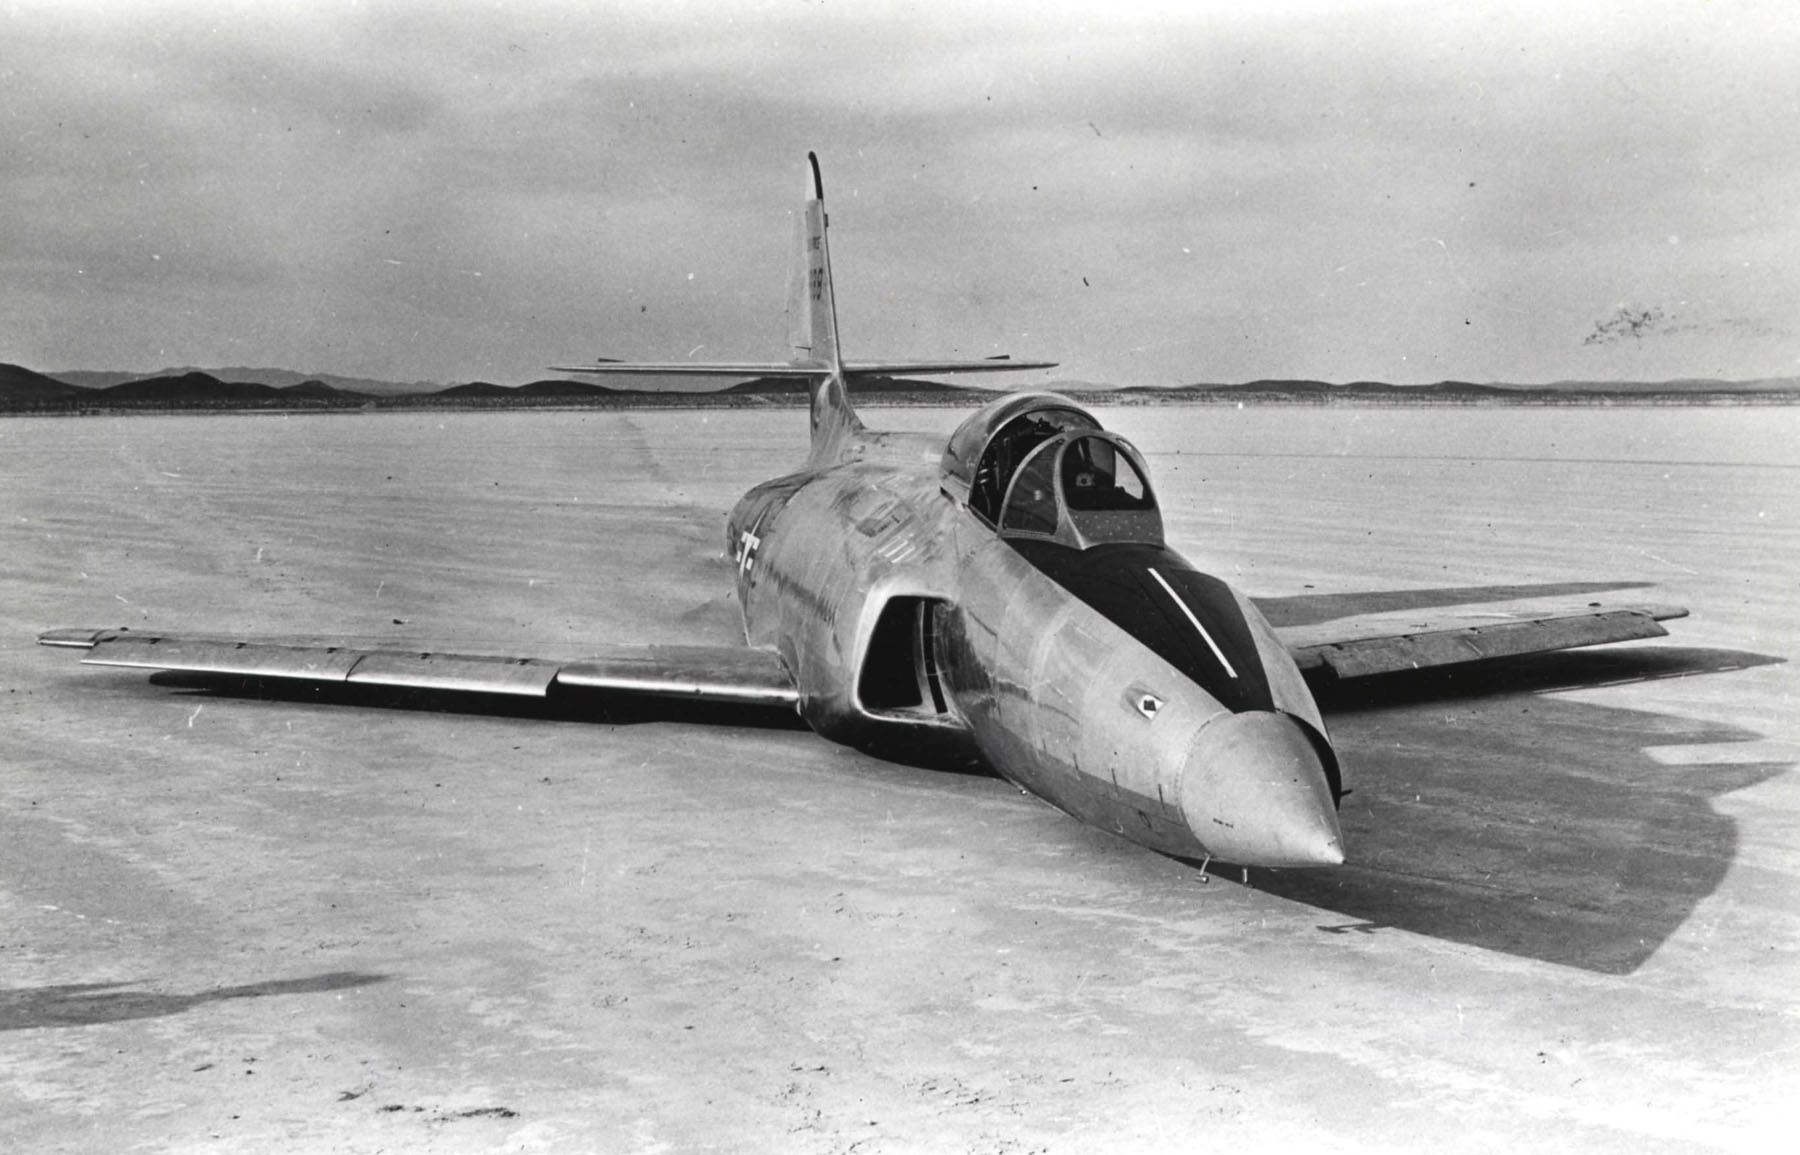 LOCKHEED XF-90 LARGE VINTAGE PHOTO US AIR FORCE USAF   eBay